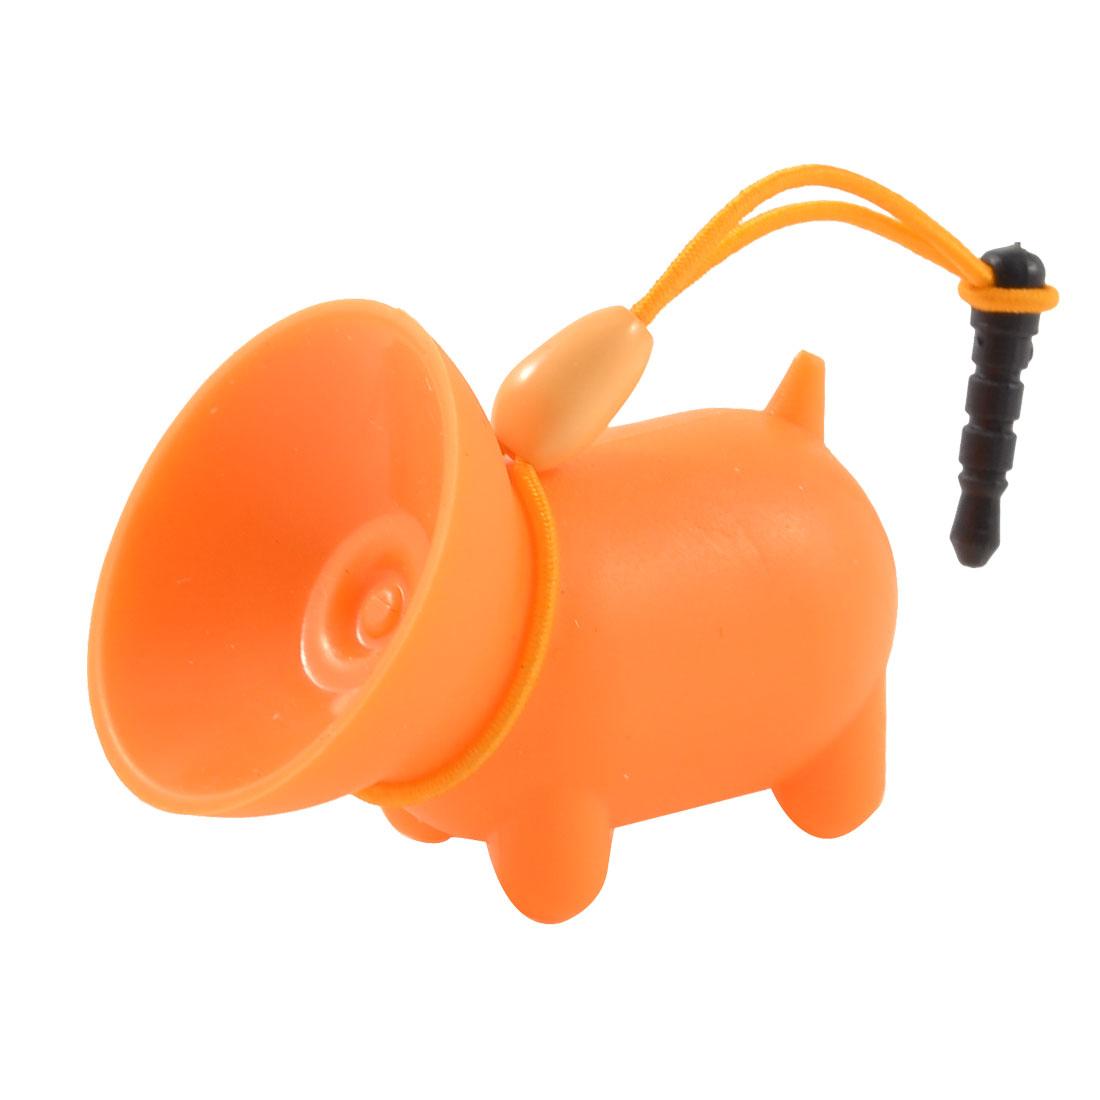 Orange Soft Plastic Pig Design Suction Stand w Dust Plug for MP4 Mobile Phone